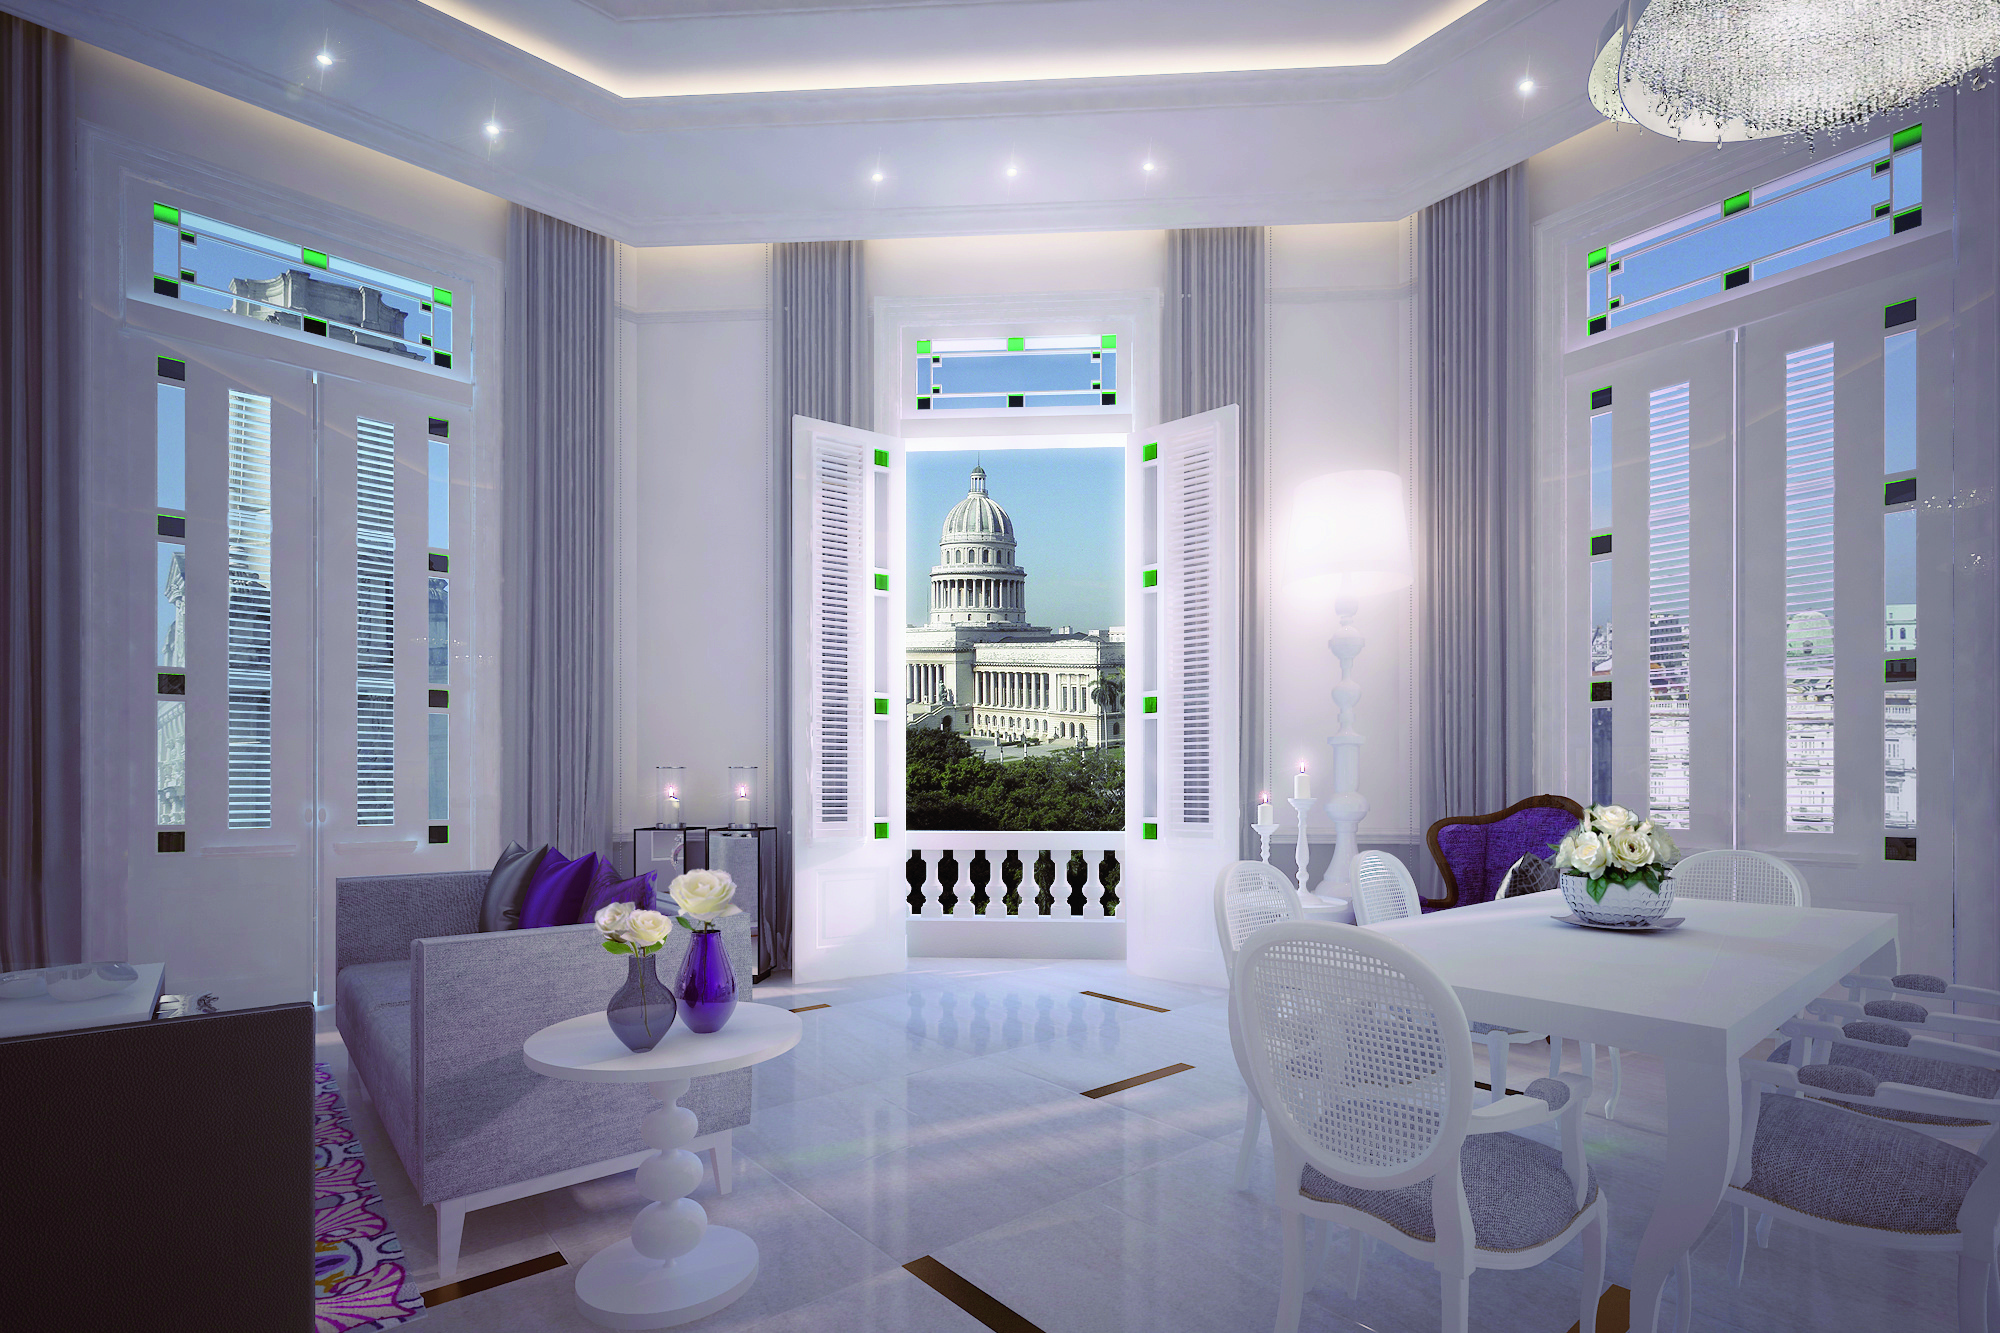 suite-presidencial-sin-flor-04_18048_print